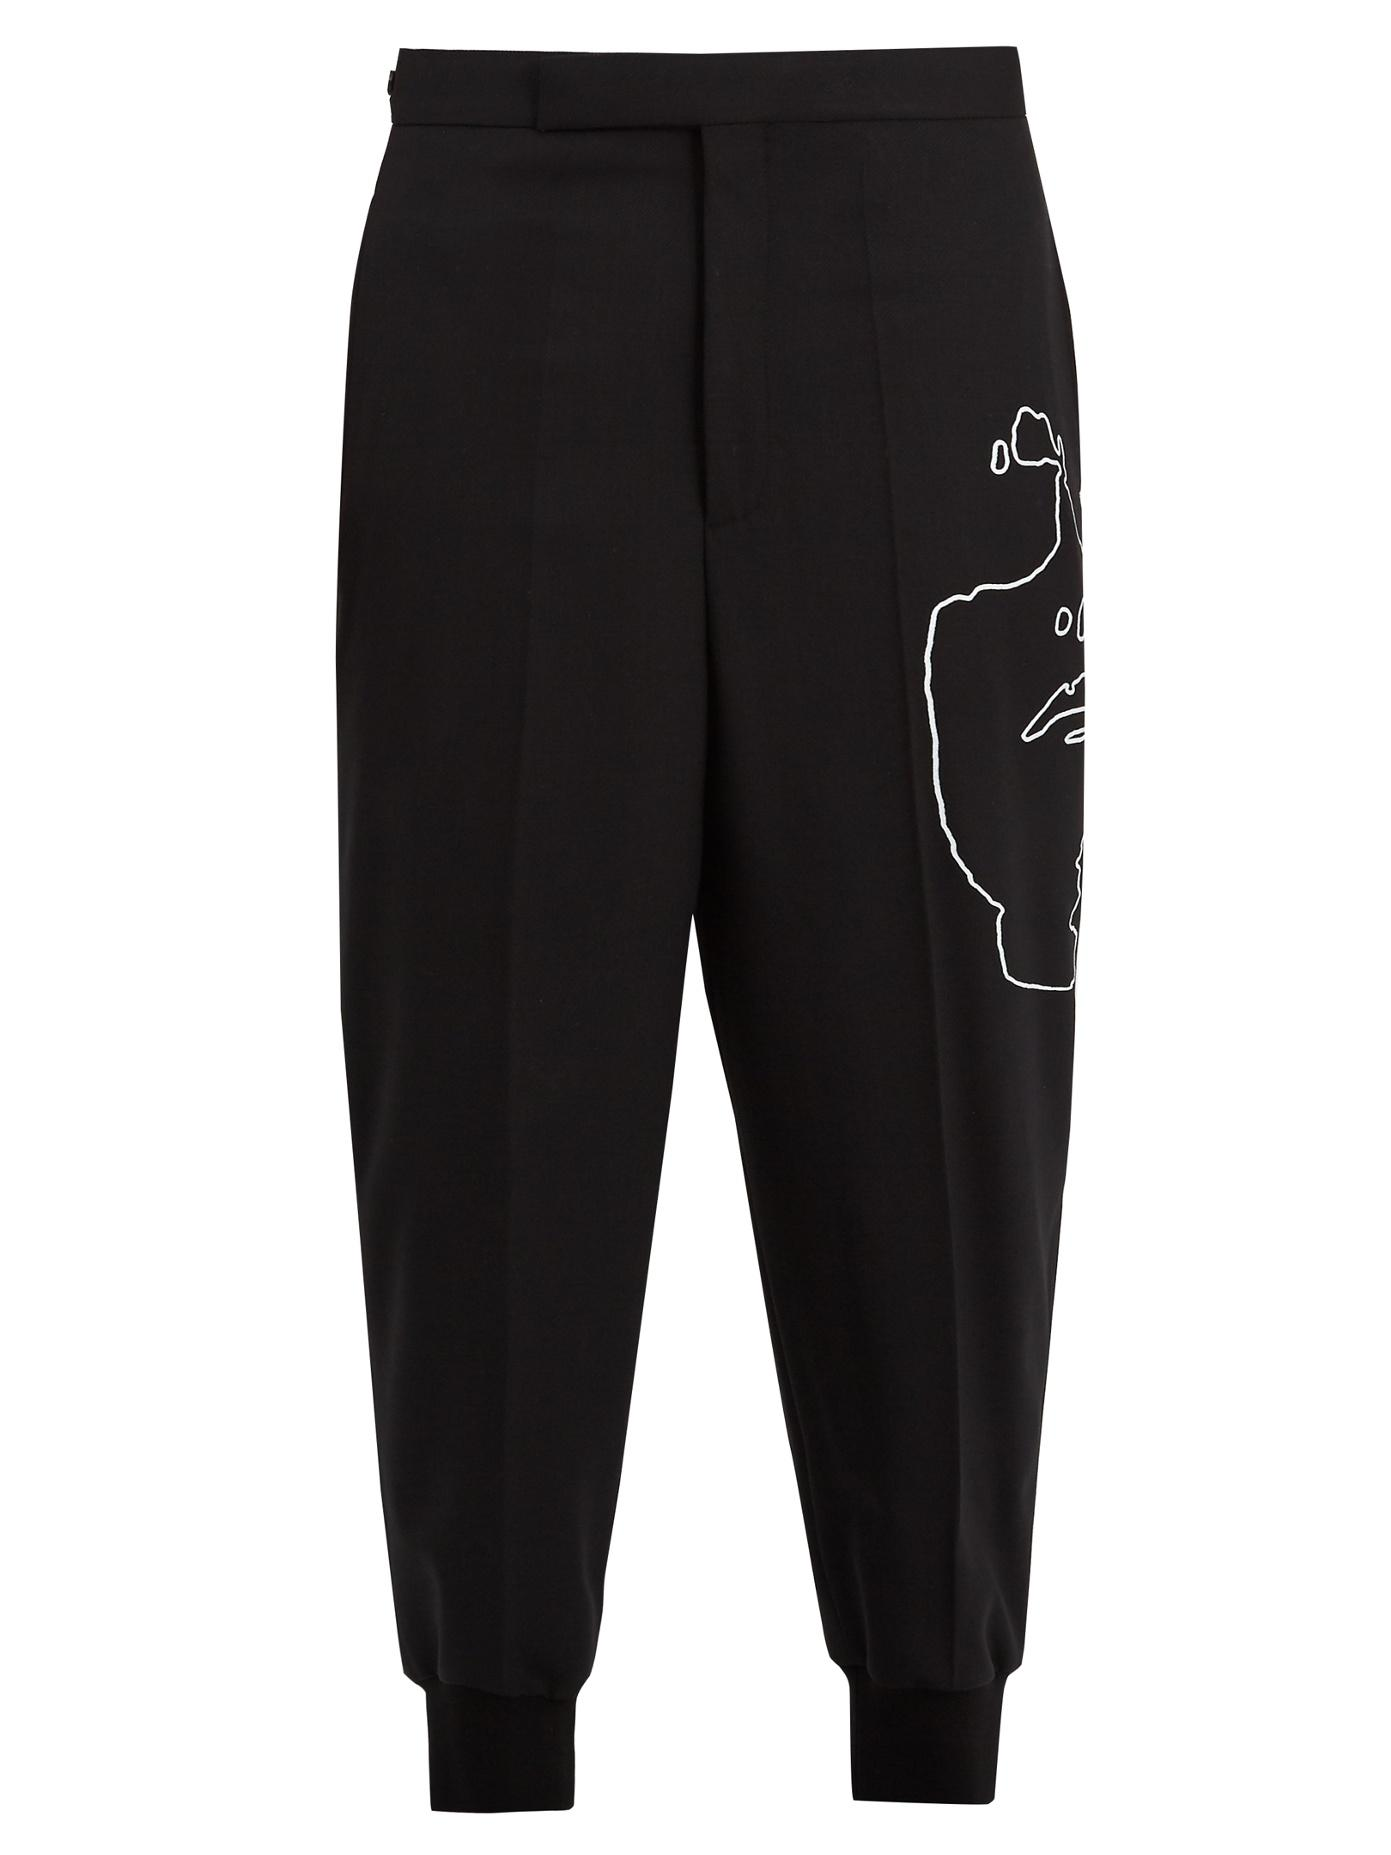 Neil Barrett Susie-Print Tapered-Leg Stretch-Wool Trousers In Black